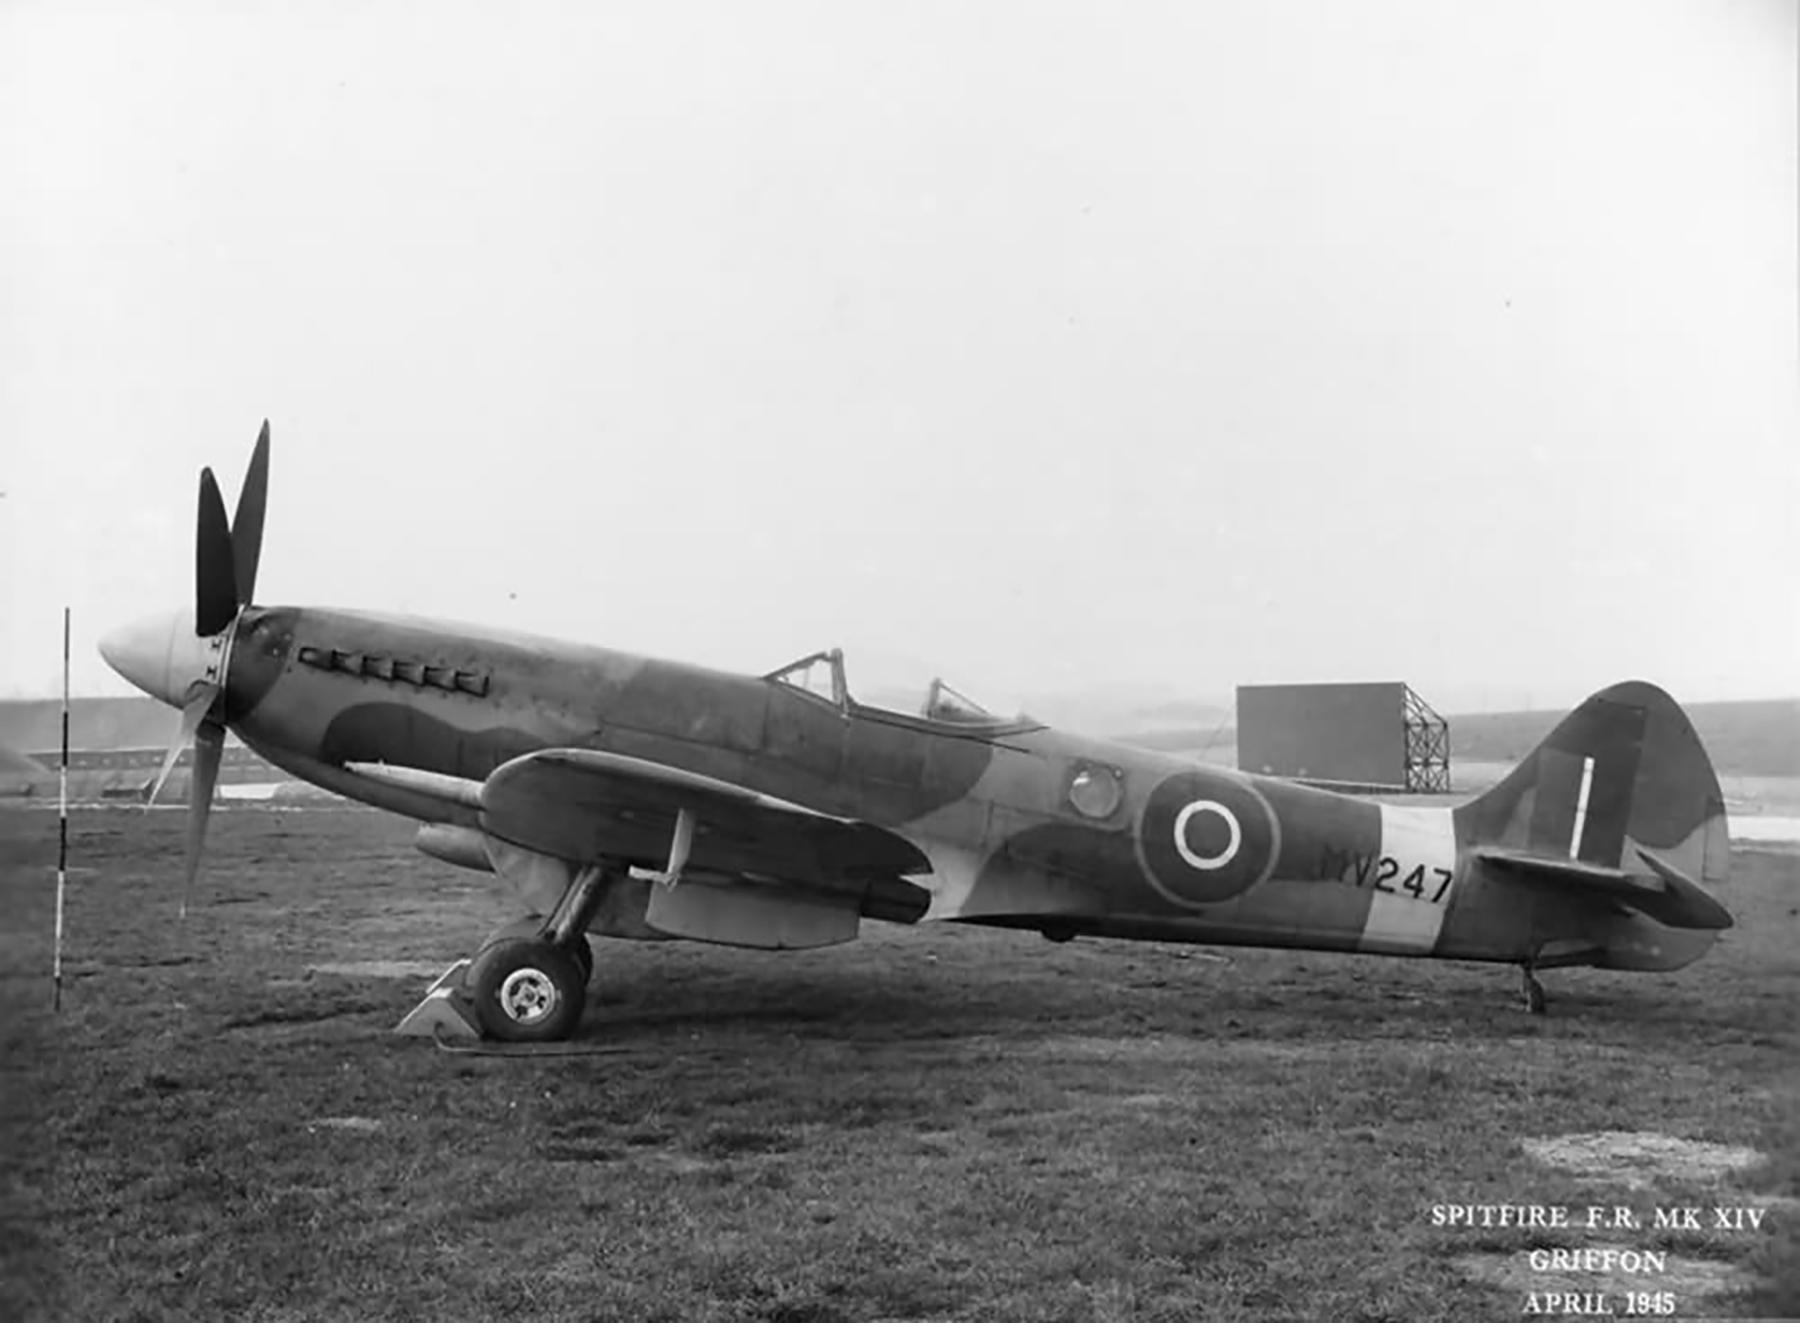 Spitfire FRXIV RAF MV247 fuel functioning tests at Boscombe Down Apr 1945 web 01